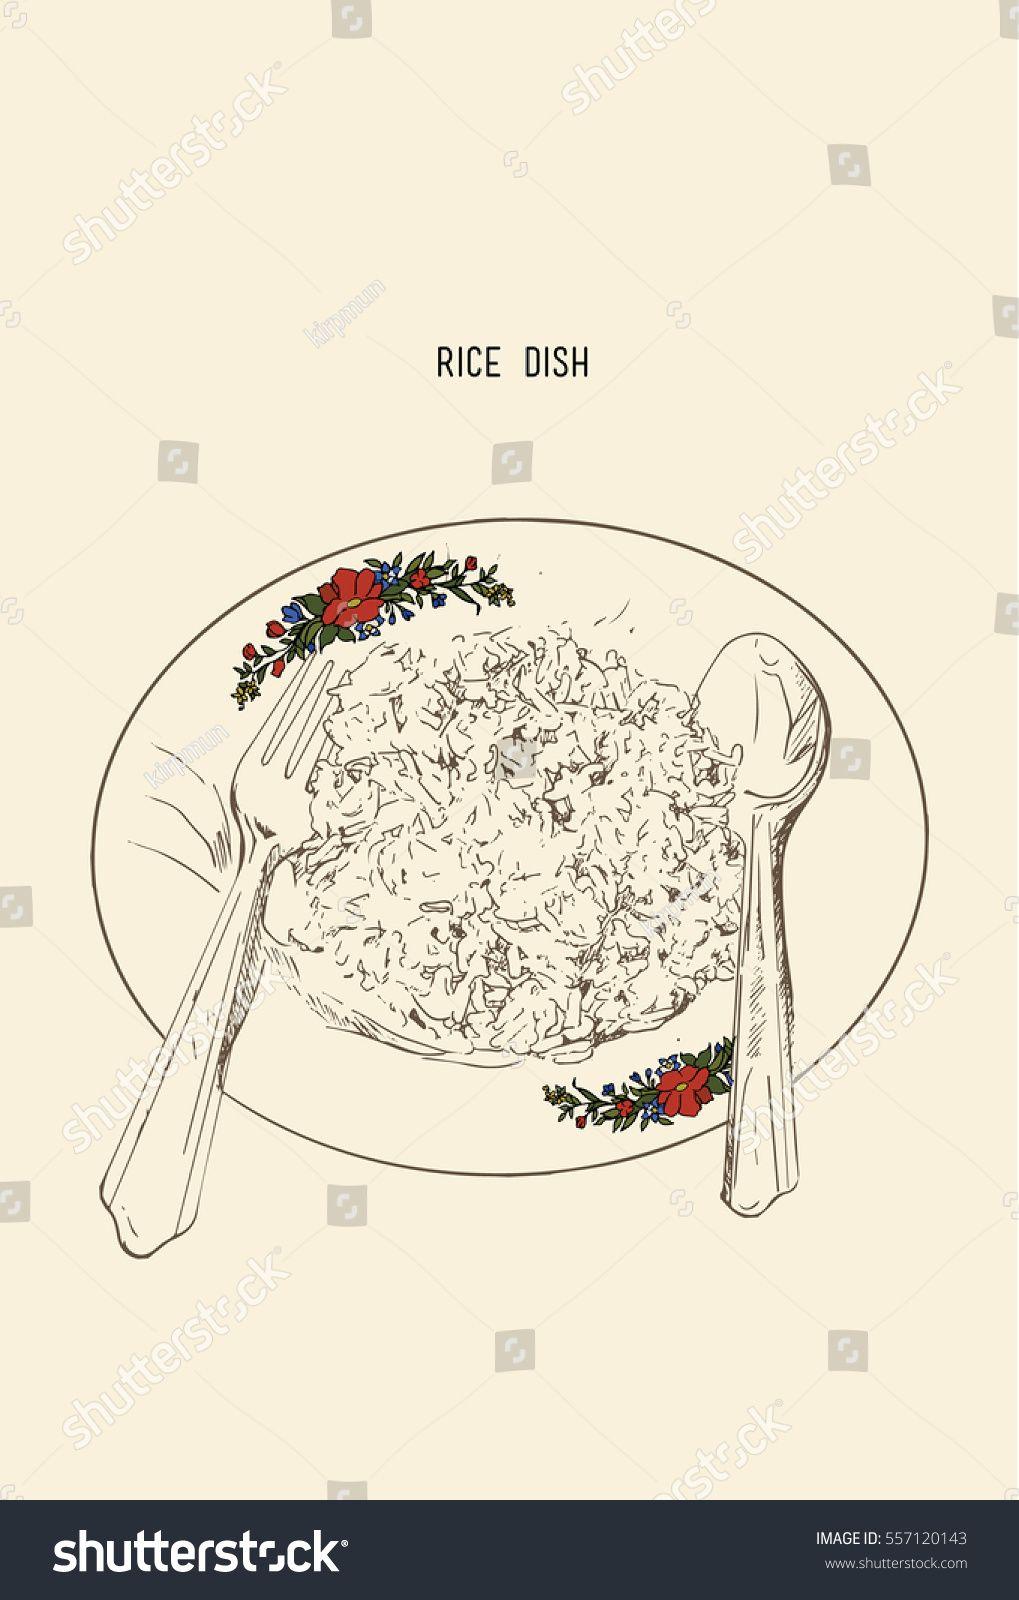 Pin On Food Drawings